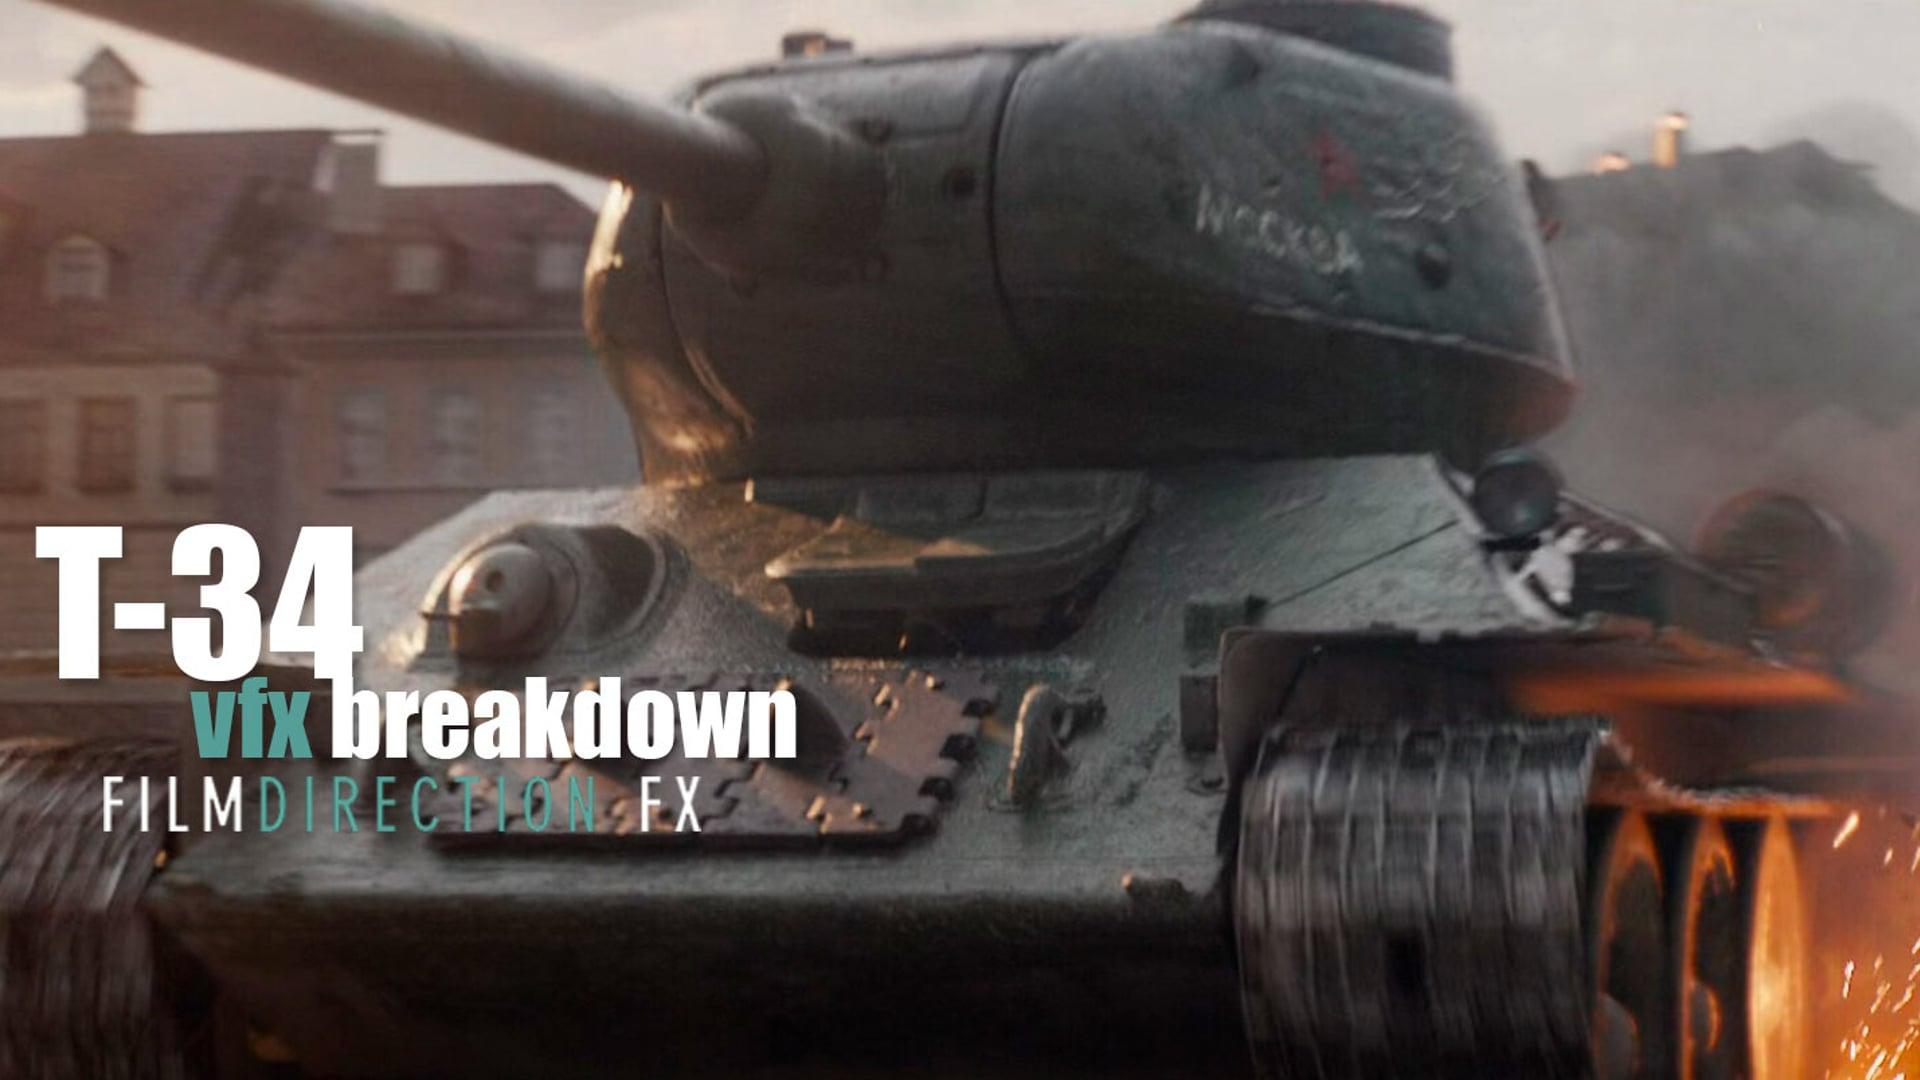 vfx breakdown T-34